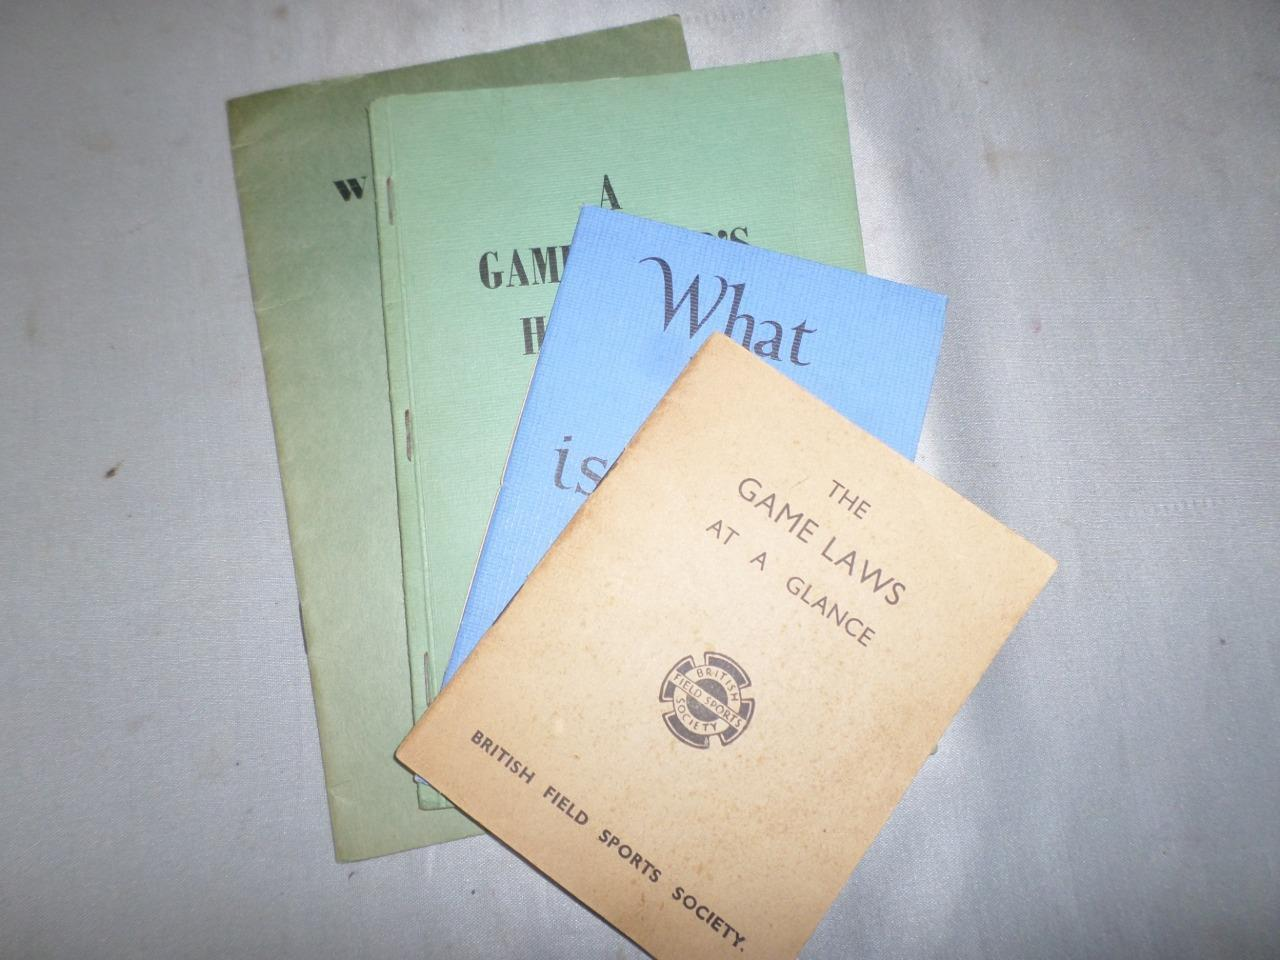 Vintage 1960s British Campo Sports sociedad Manuales-gamekeeping Pesca Tiro